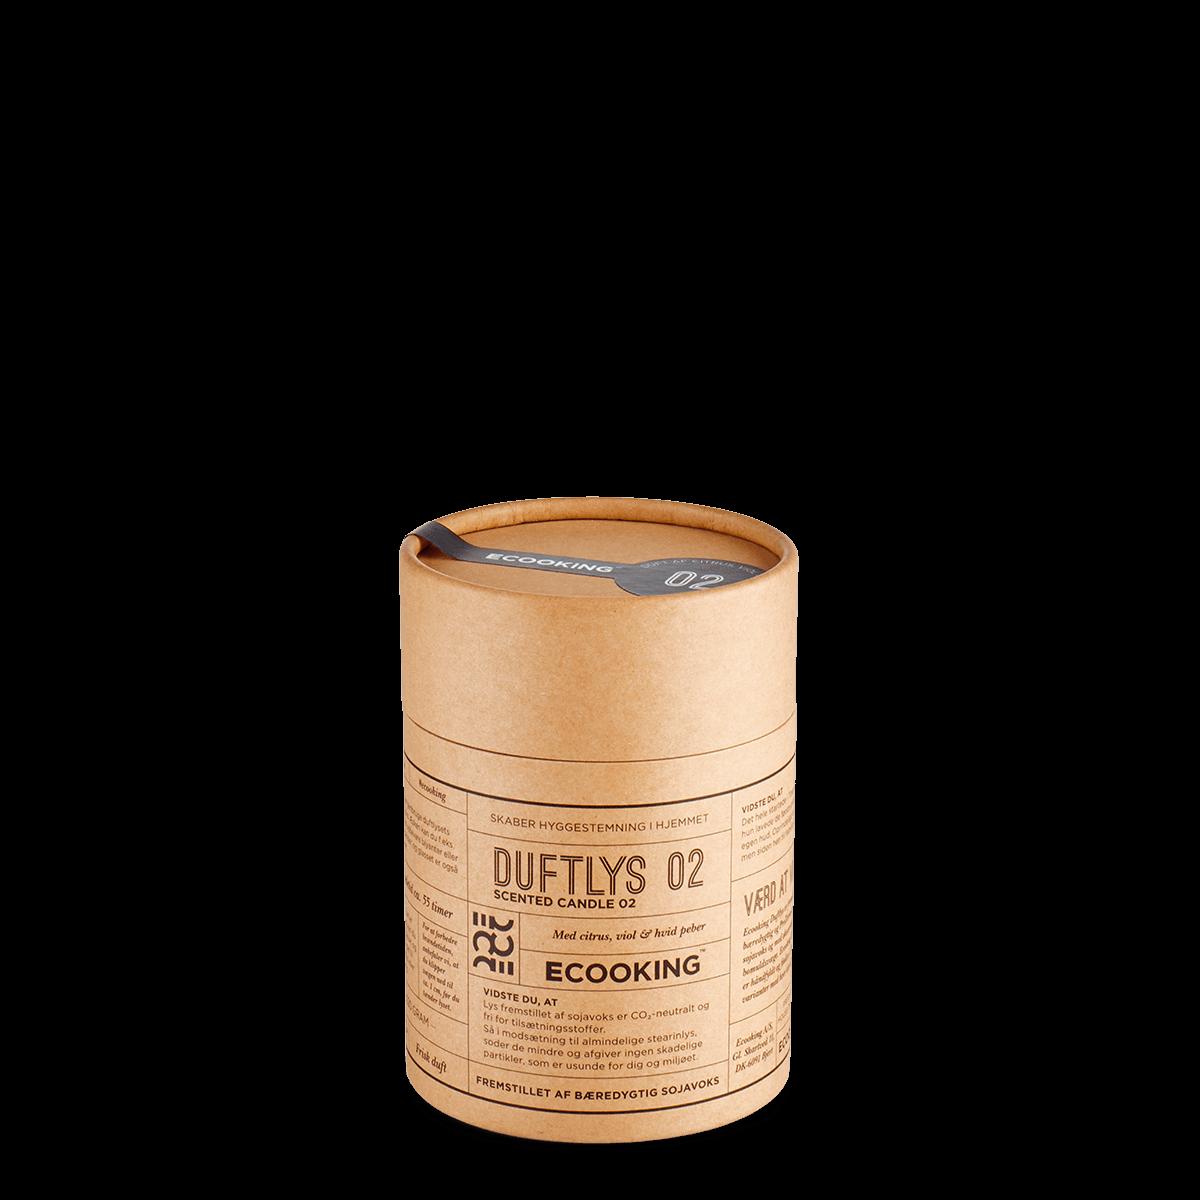 Duftlys 02 220 gram